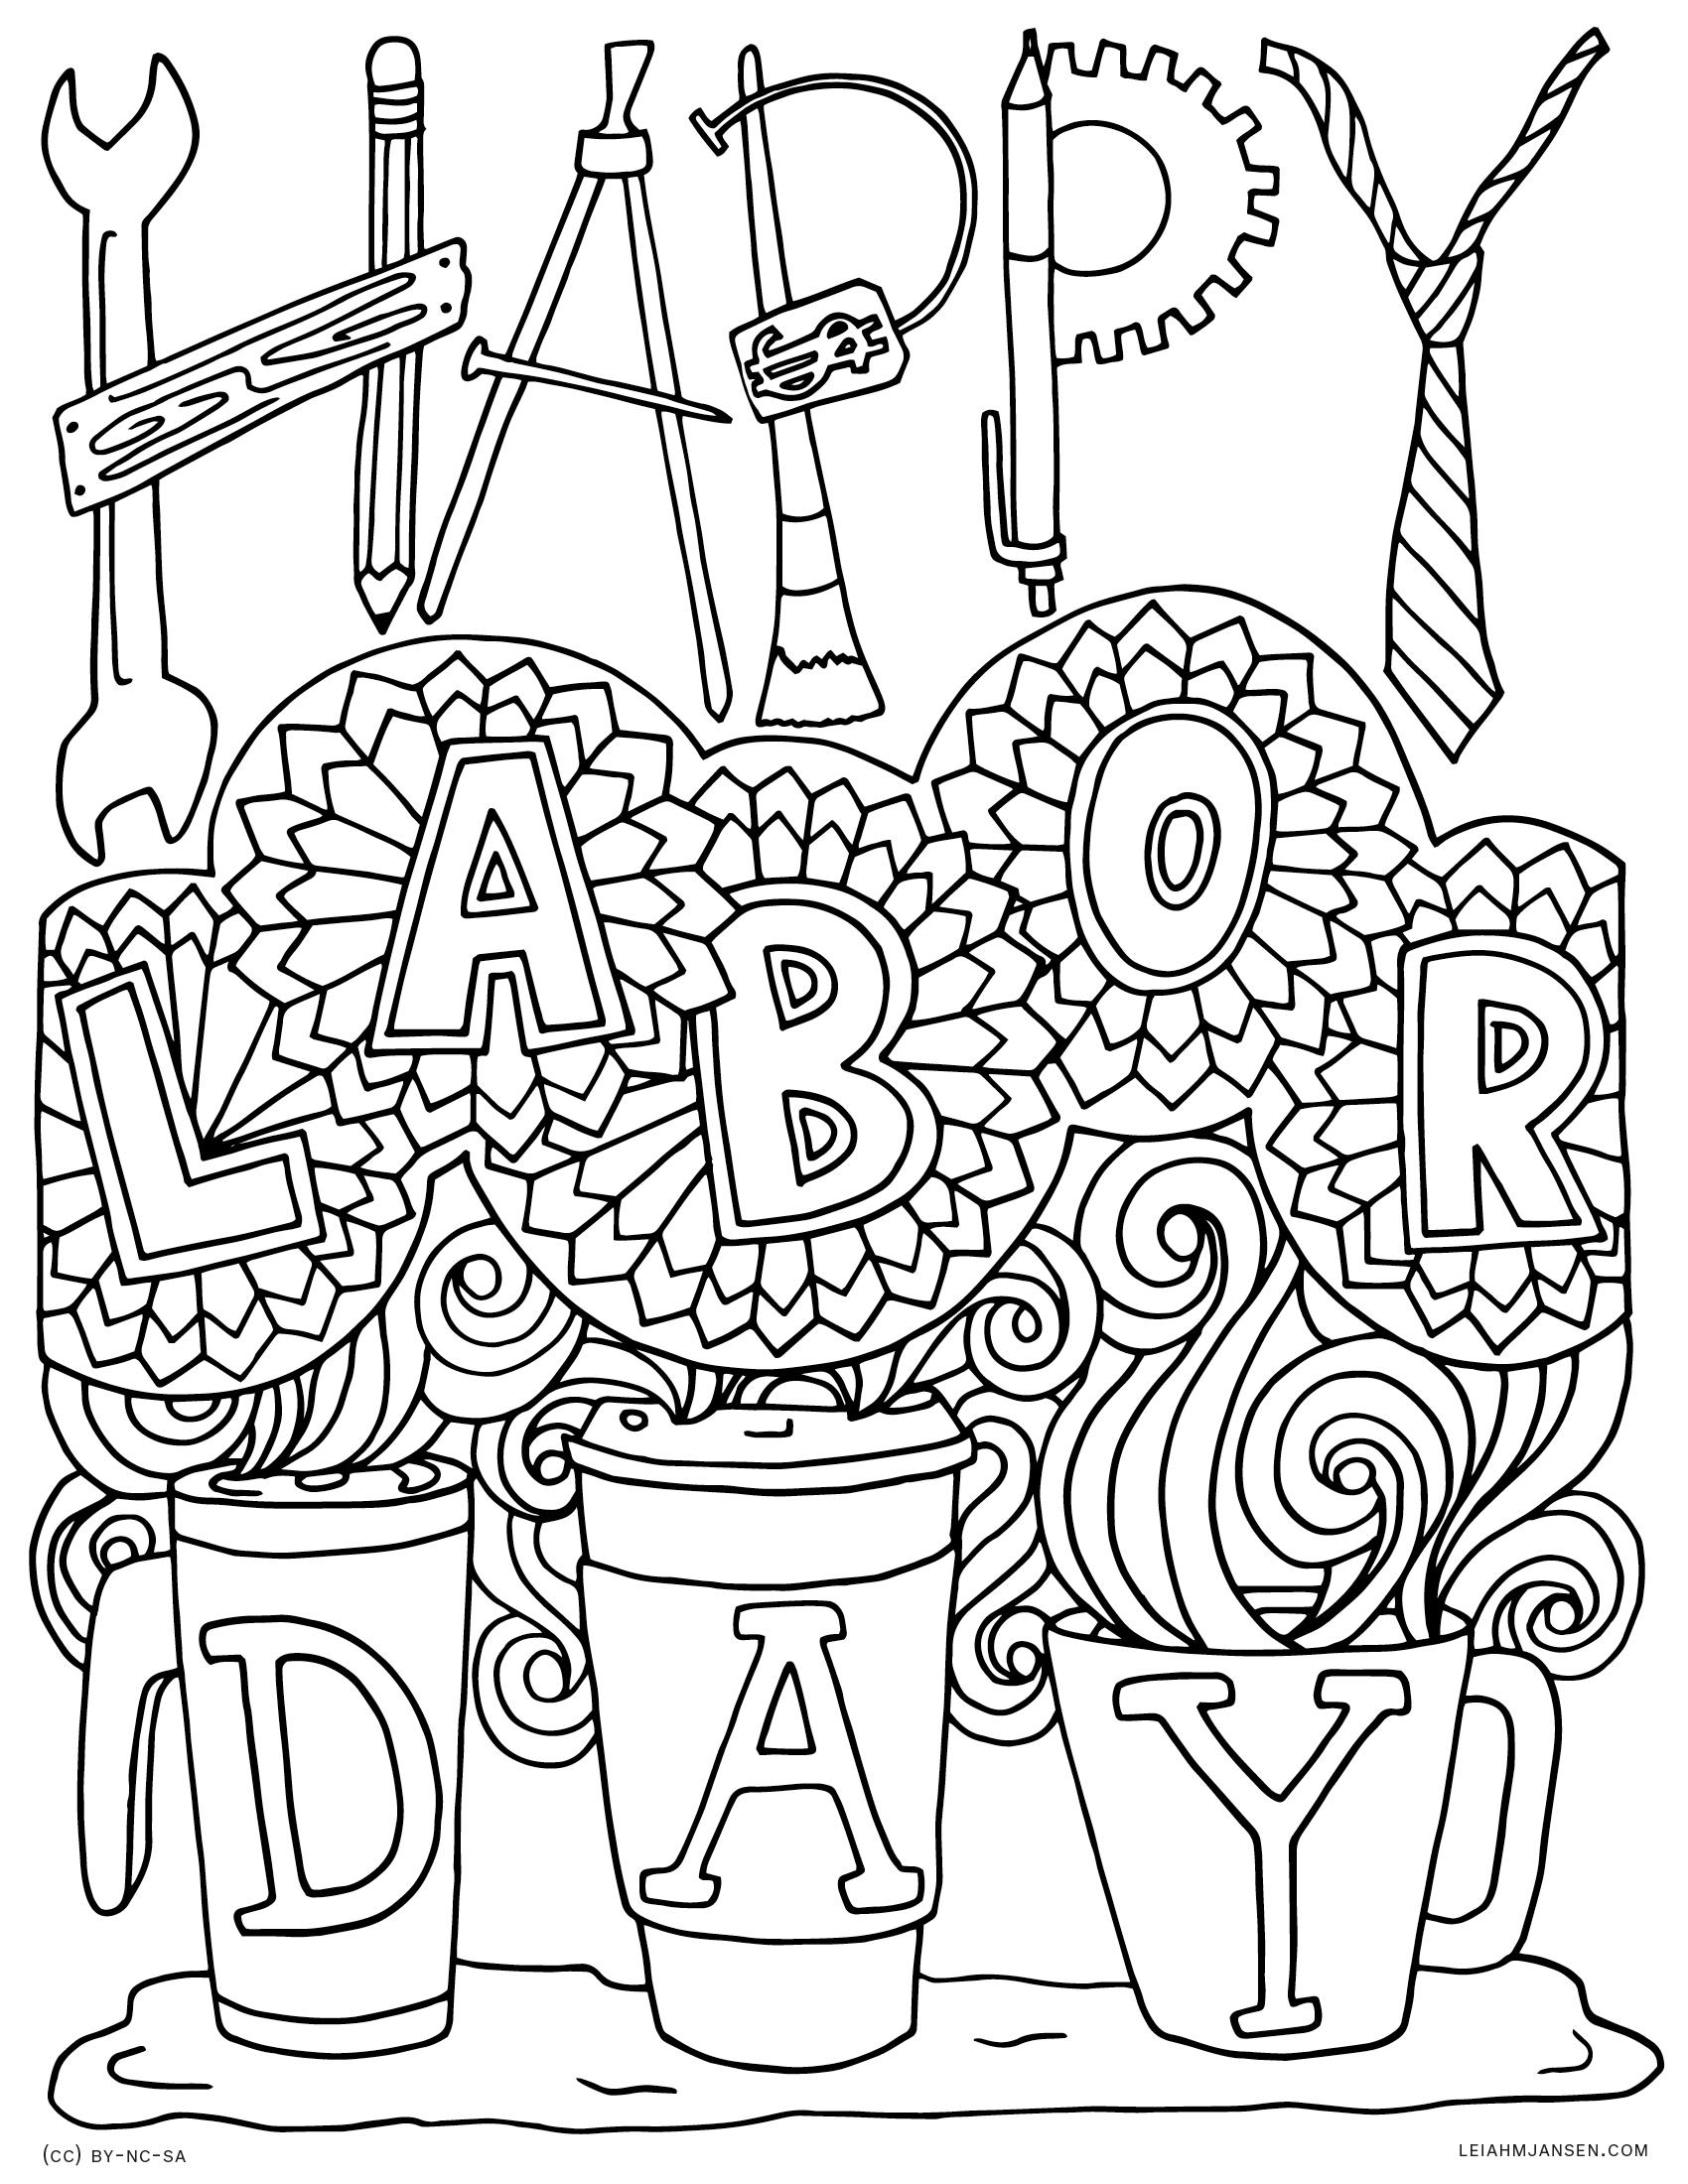 labor day coloring page happy labor day coloring page free printable coloring pages page day coloring labor